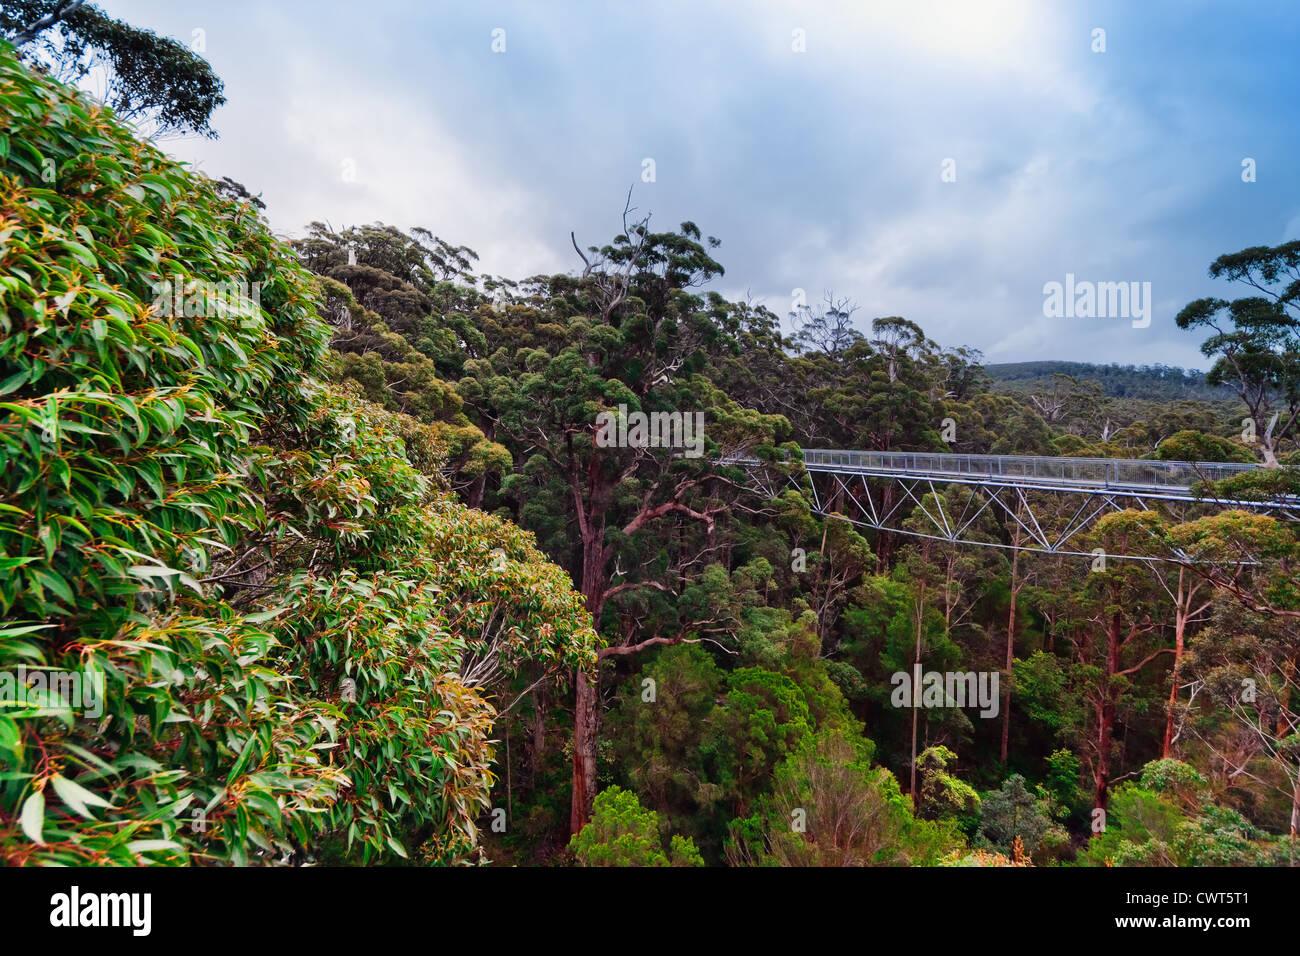 A treetop walk path - In Walpole, Western Australia - Stock Image